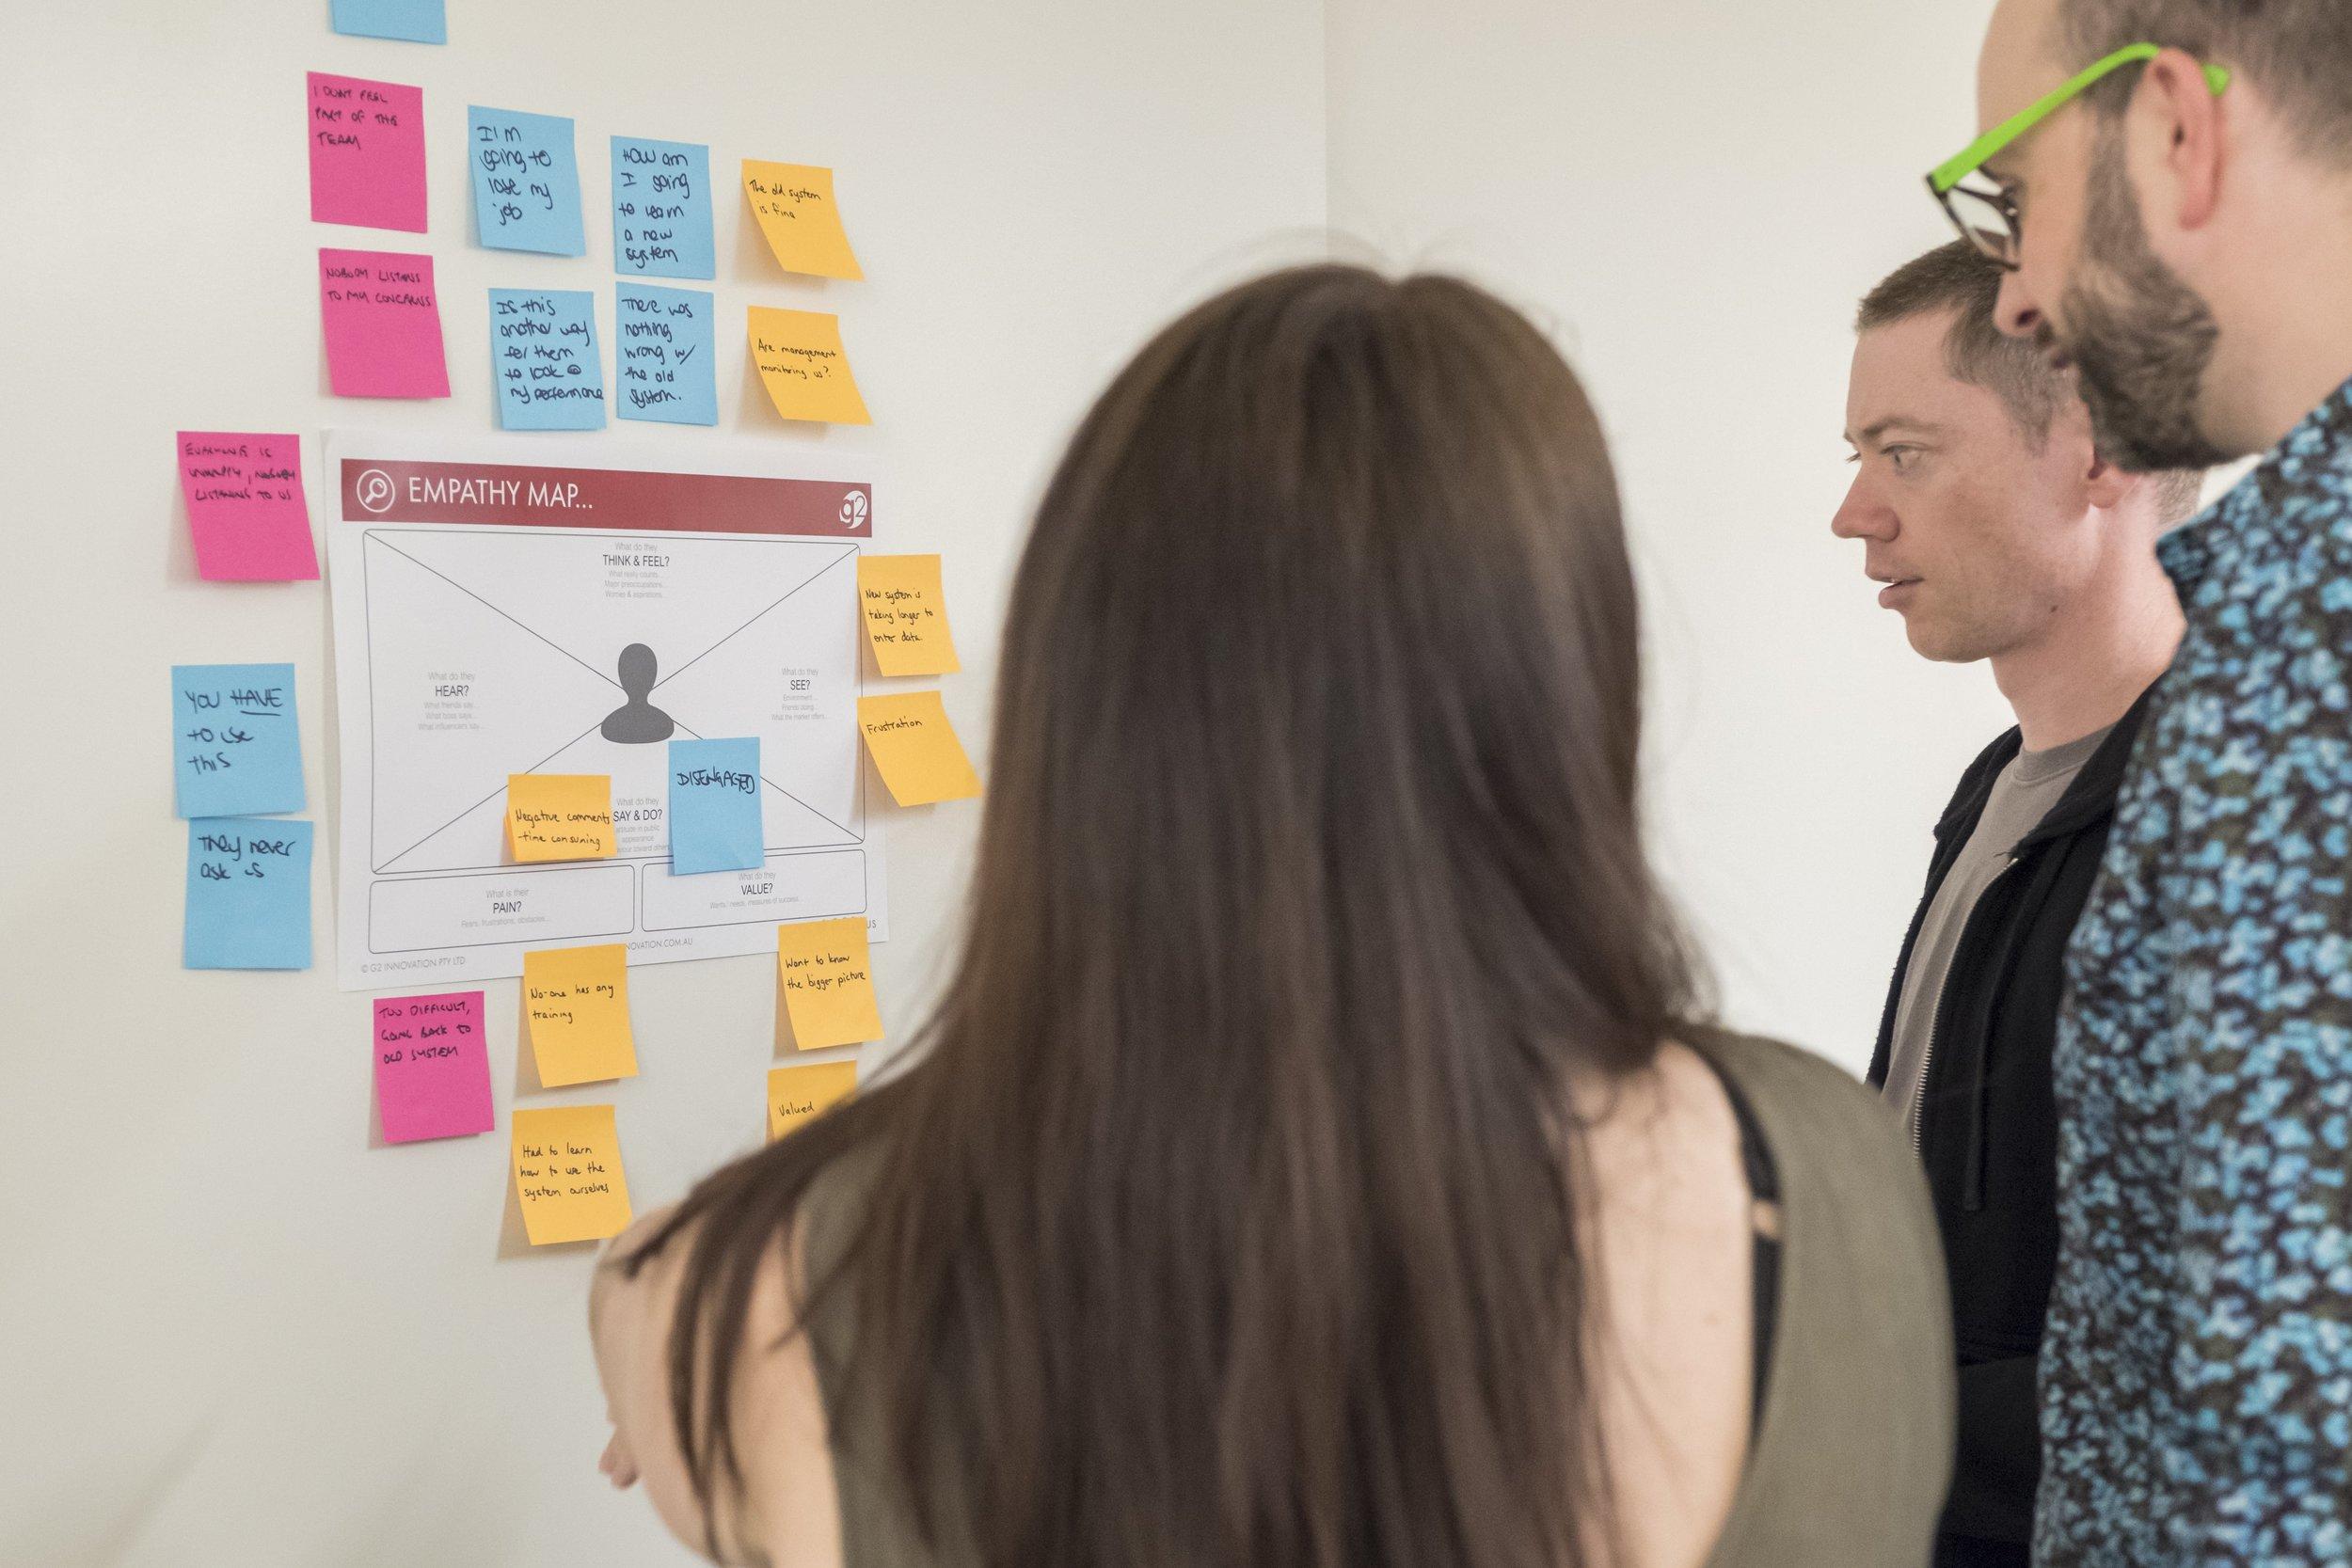 Design Thinking Workshop empathy map